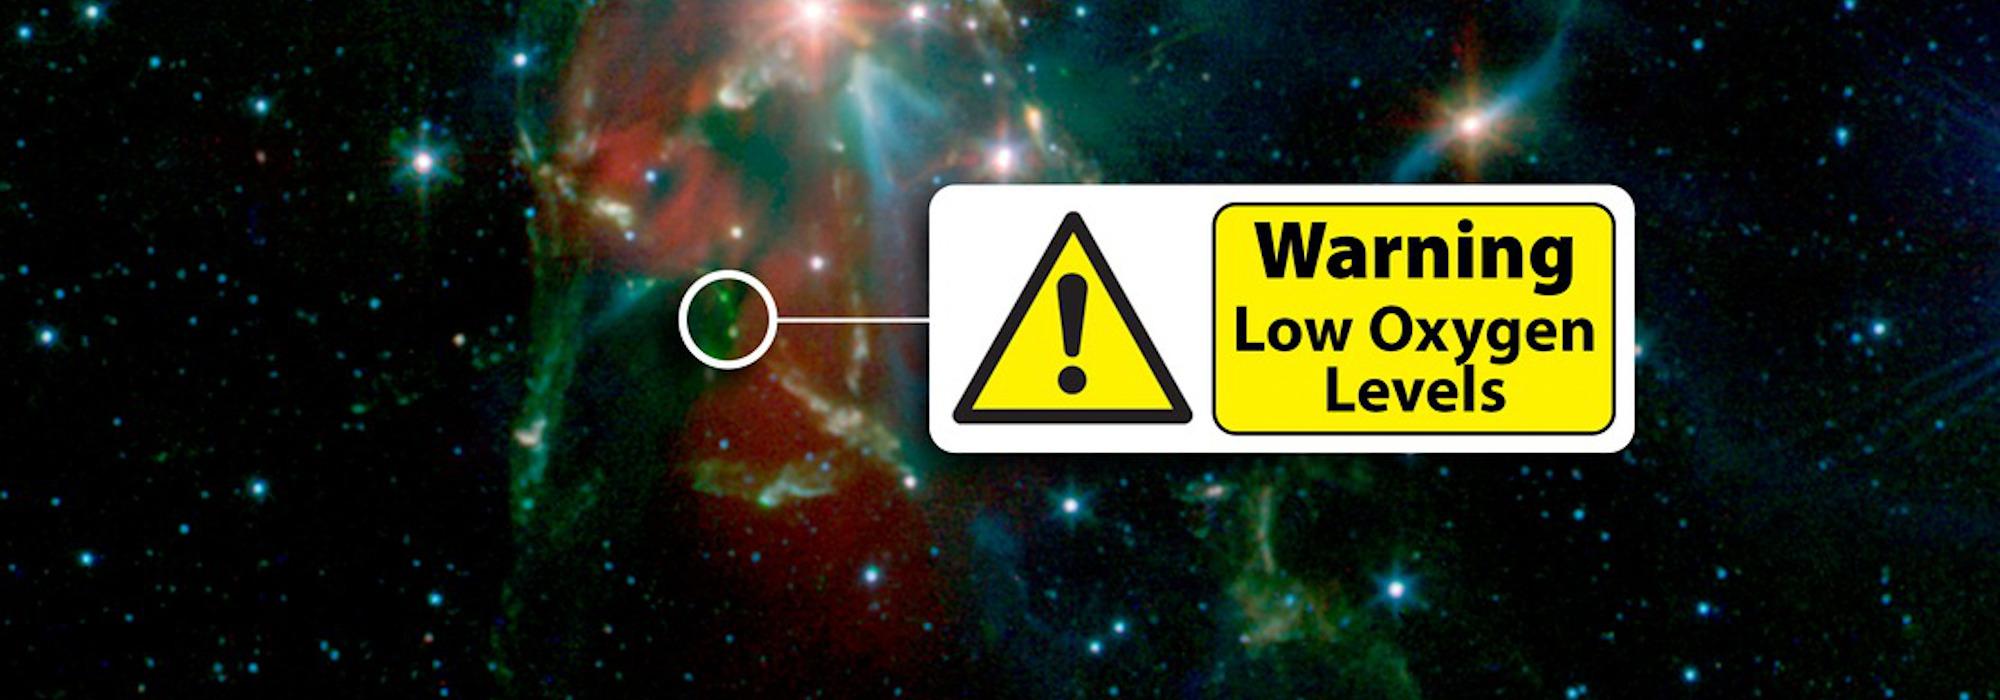 Press Release: Herschel Uncovers a Dearth of Oxygen near a New Star